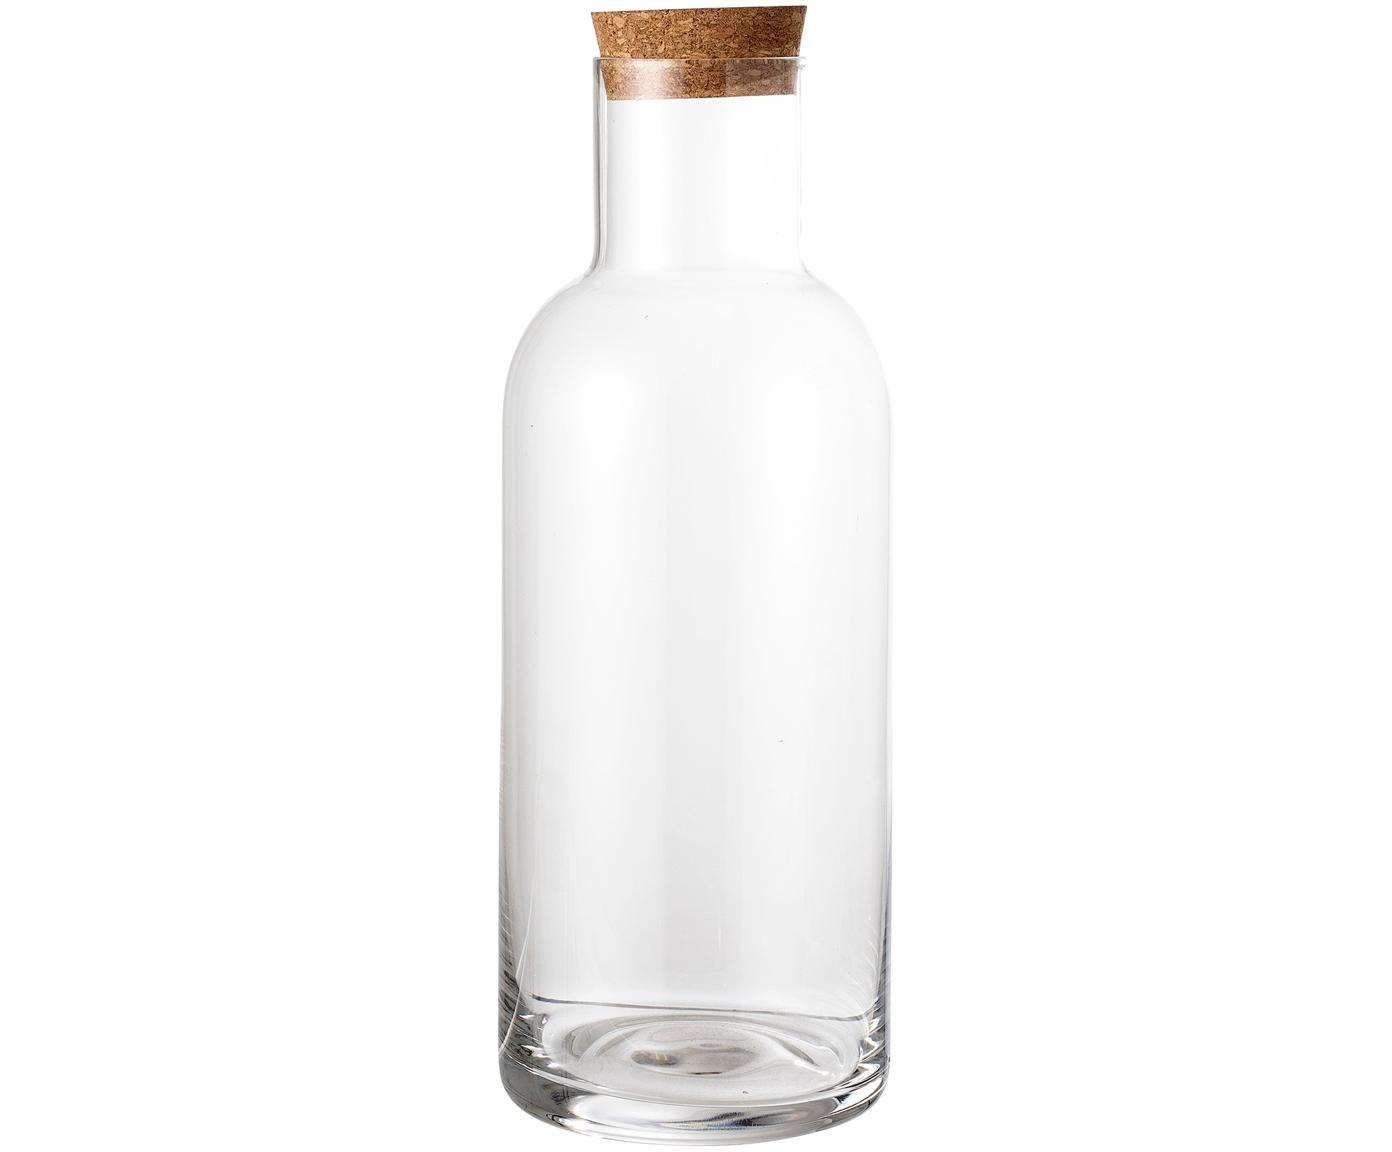 Karaffe Clearance in Transparent, Deckel: Kork, Transparent, 1 L